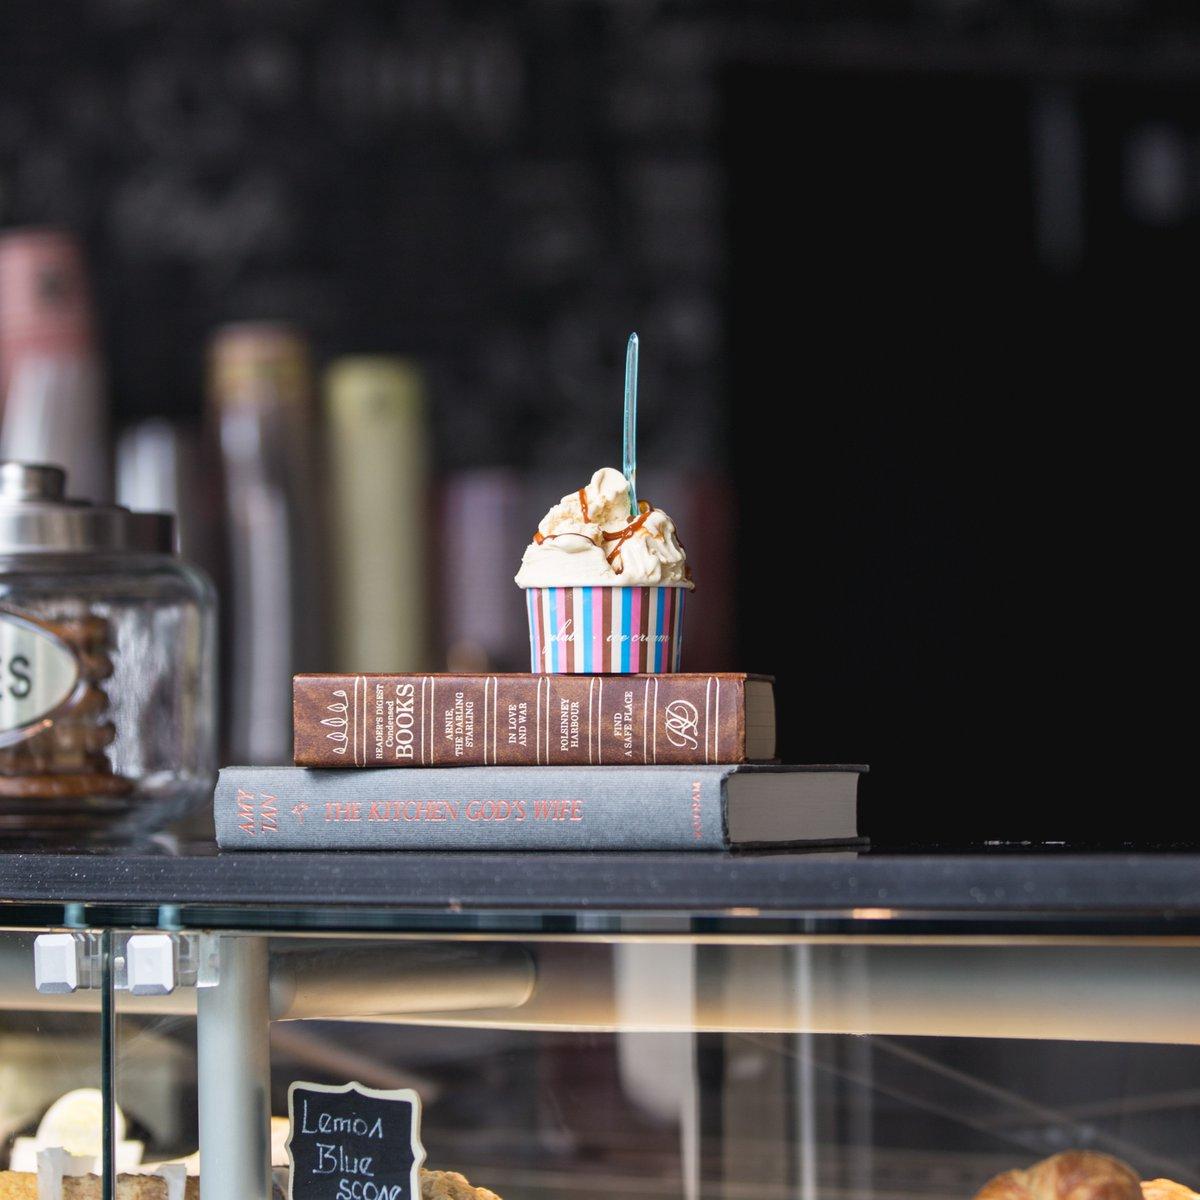 Who's always craving gelato? Because I know we are!  Visit us at 550 Queens Quay to try the best gelato in town! ♡  #touticafe #gelato #delicious #instagood #instafood  #gelatospot #torontoeats #gelatonaturale #handmade #foodporn #foodie #torontoeats #foodforthegram pic.twitter.com/220aHpUq4f